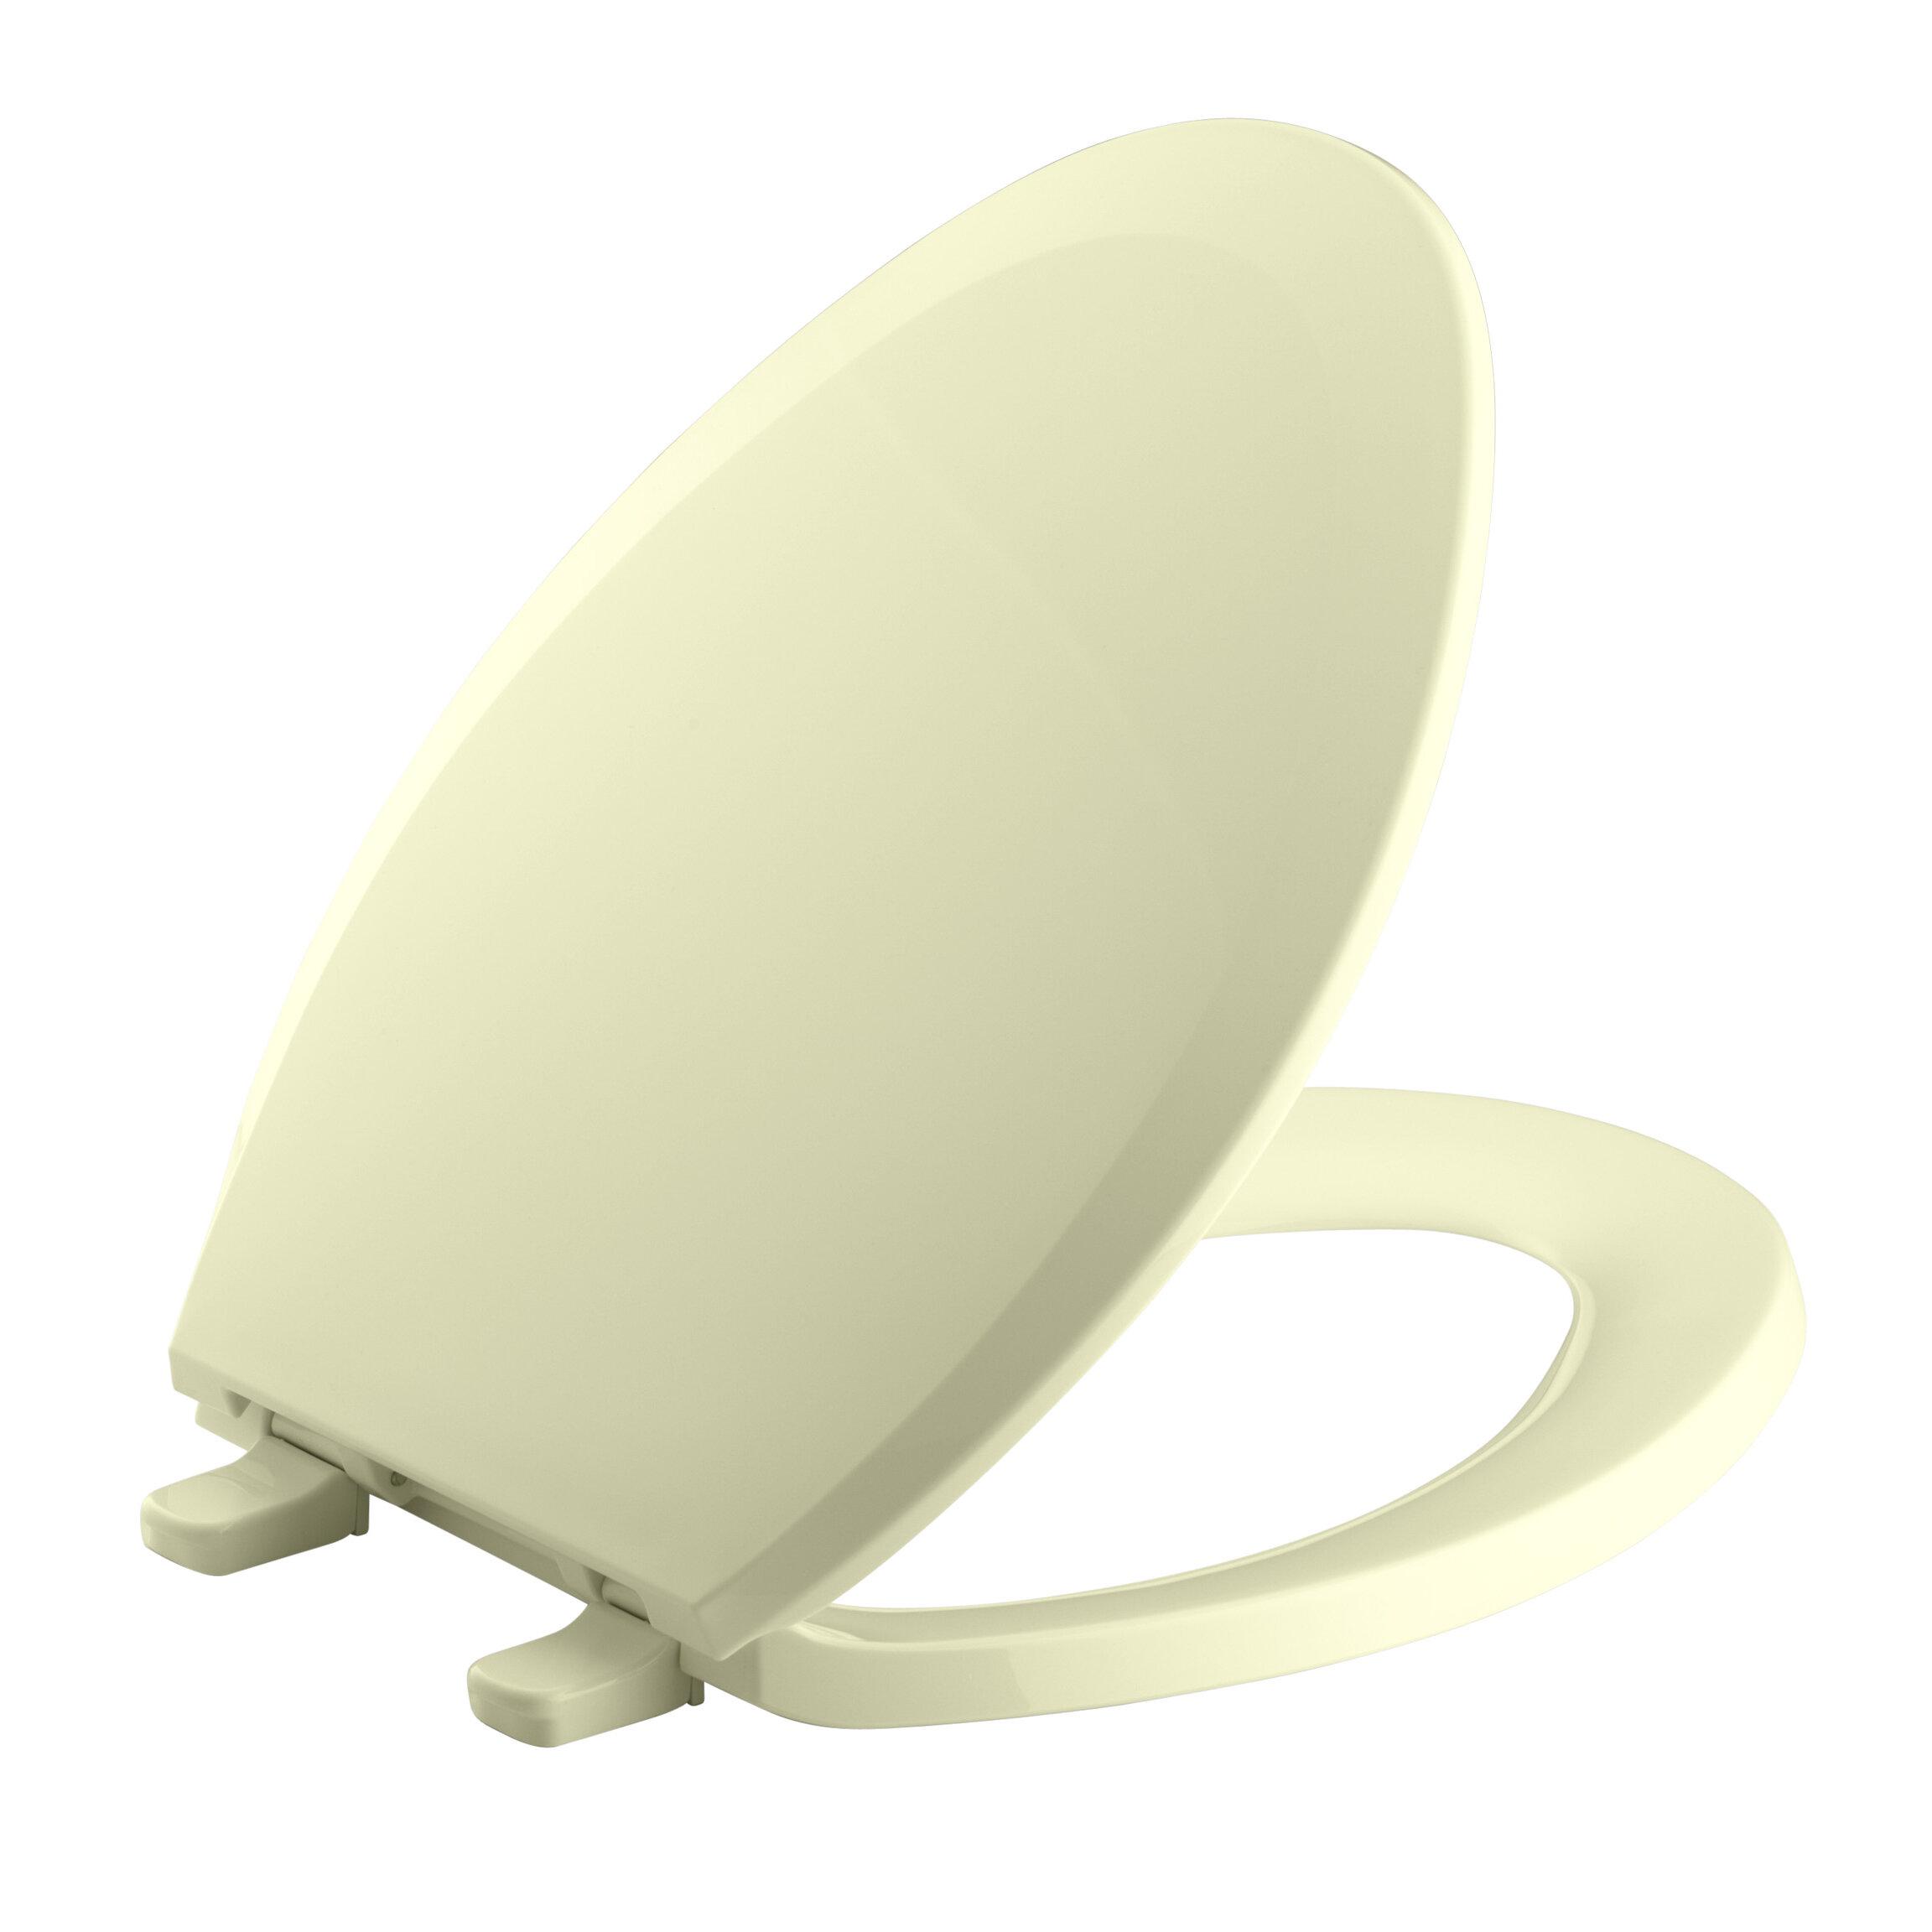 Pleasant Kohler Lustra With Quick Release Hinges Elongated Toilet Seat Uwap Interior Chair Design Uwaporg